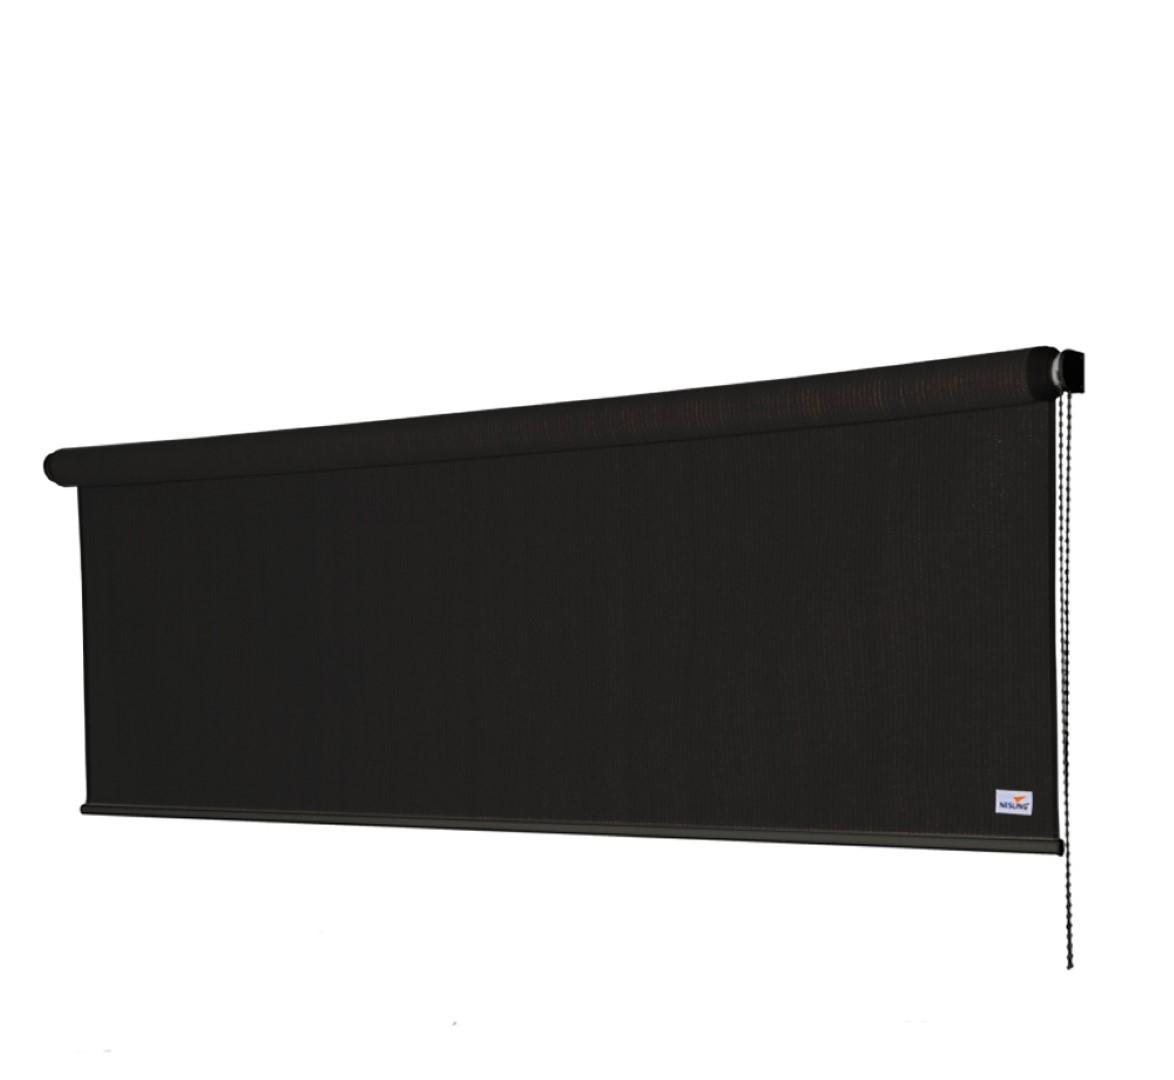 Rolgordijn B 1,48 x L 2,4m, Zwart